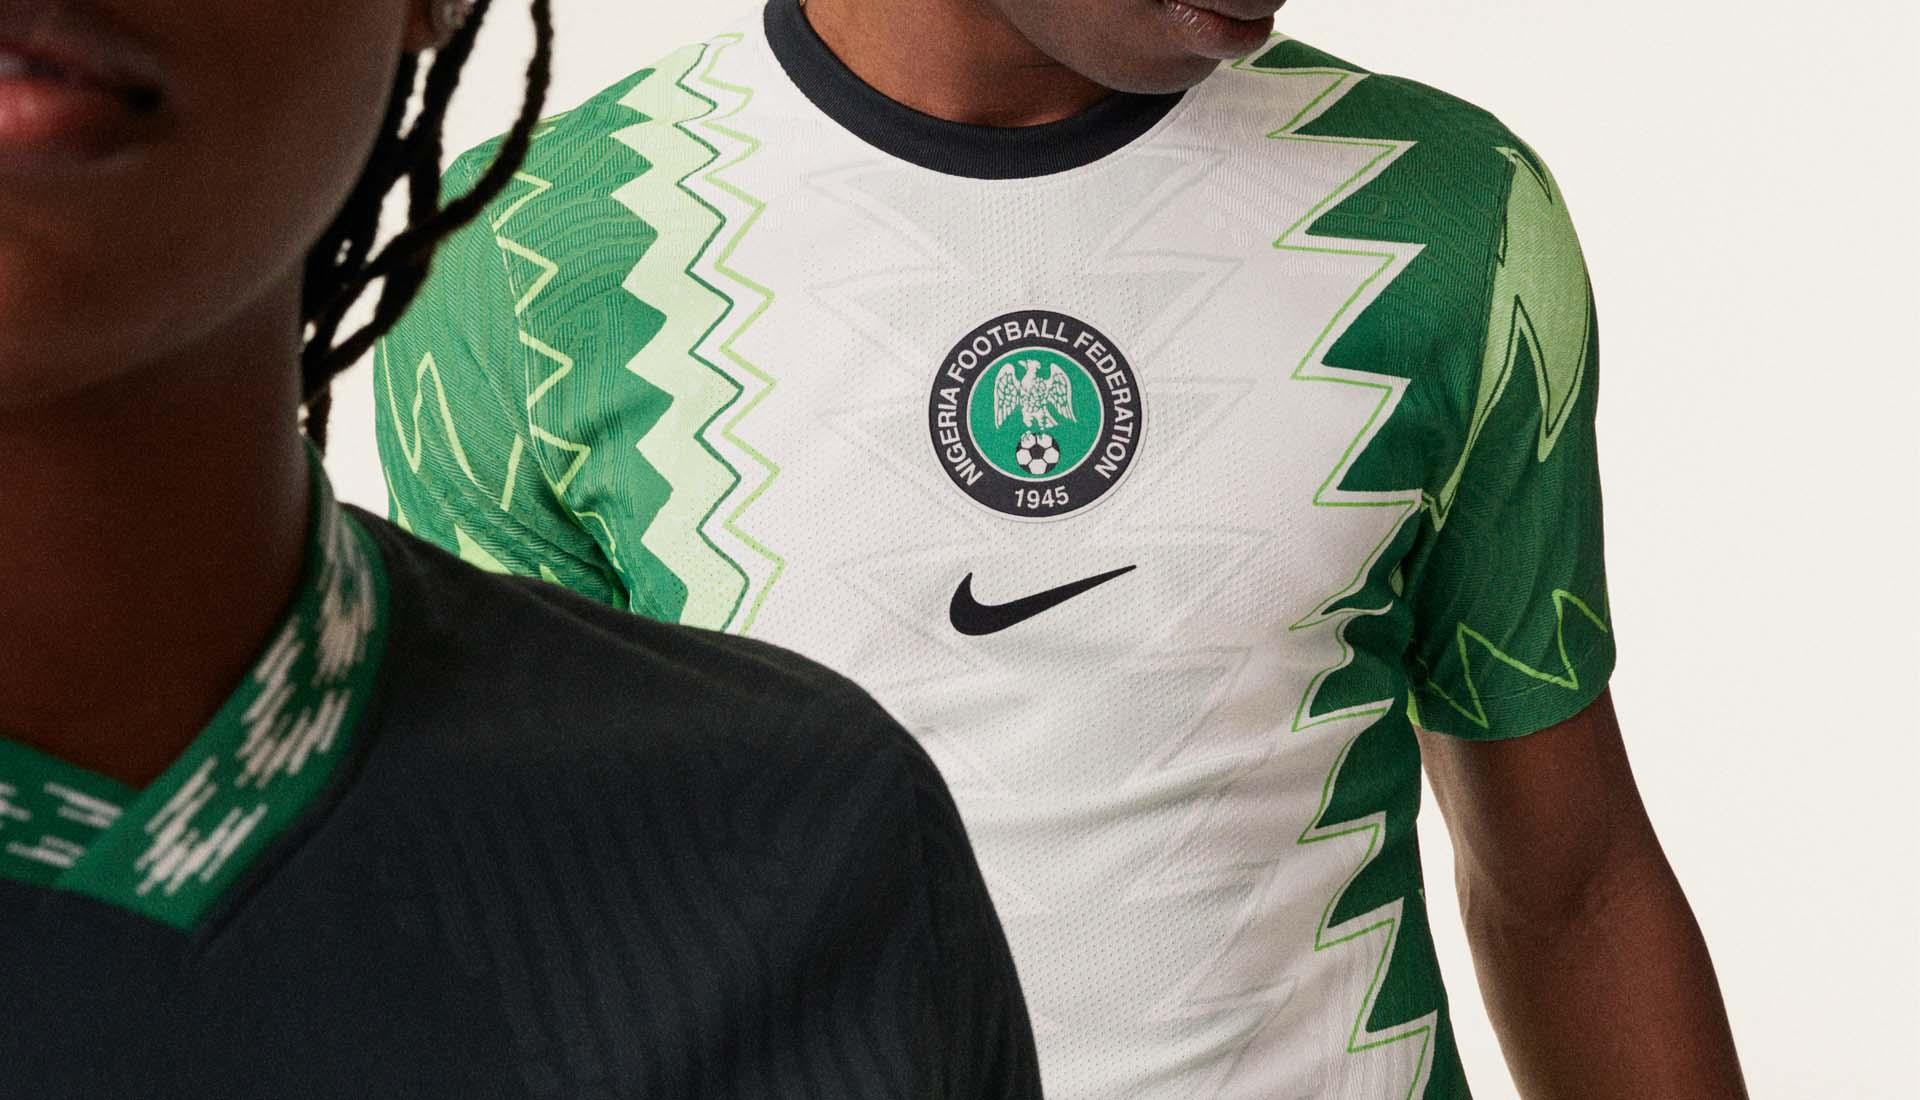 Superposición Problema Travieso  Nike Launch 2020 Kits For Nigeria, USA & South Korea - SoccerBible